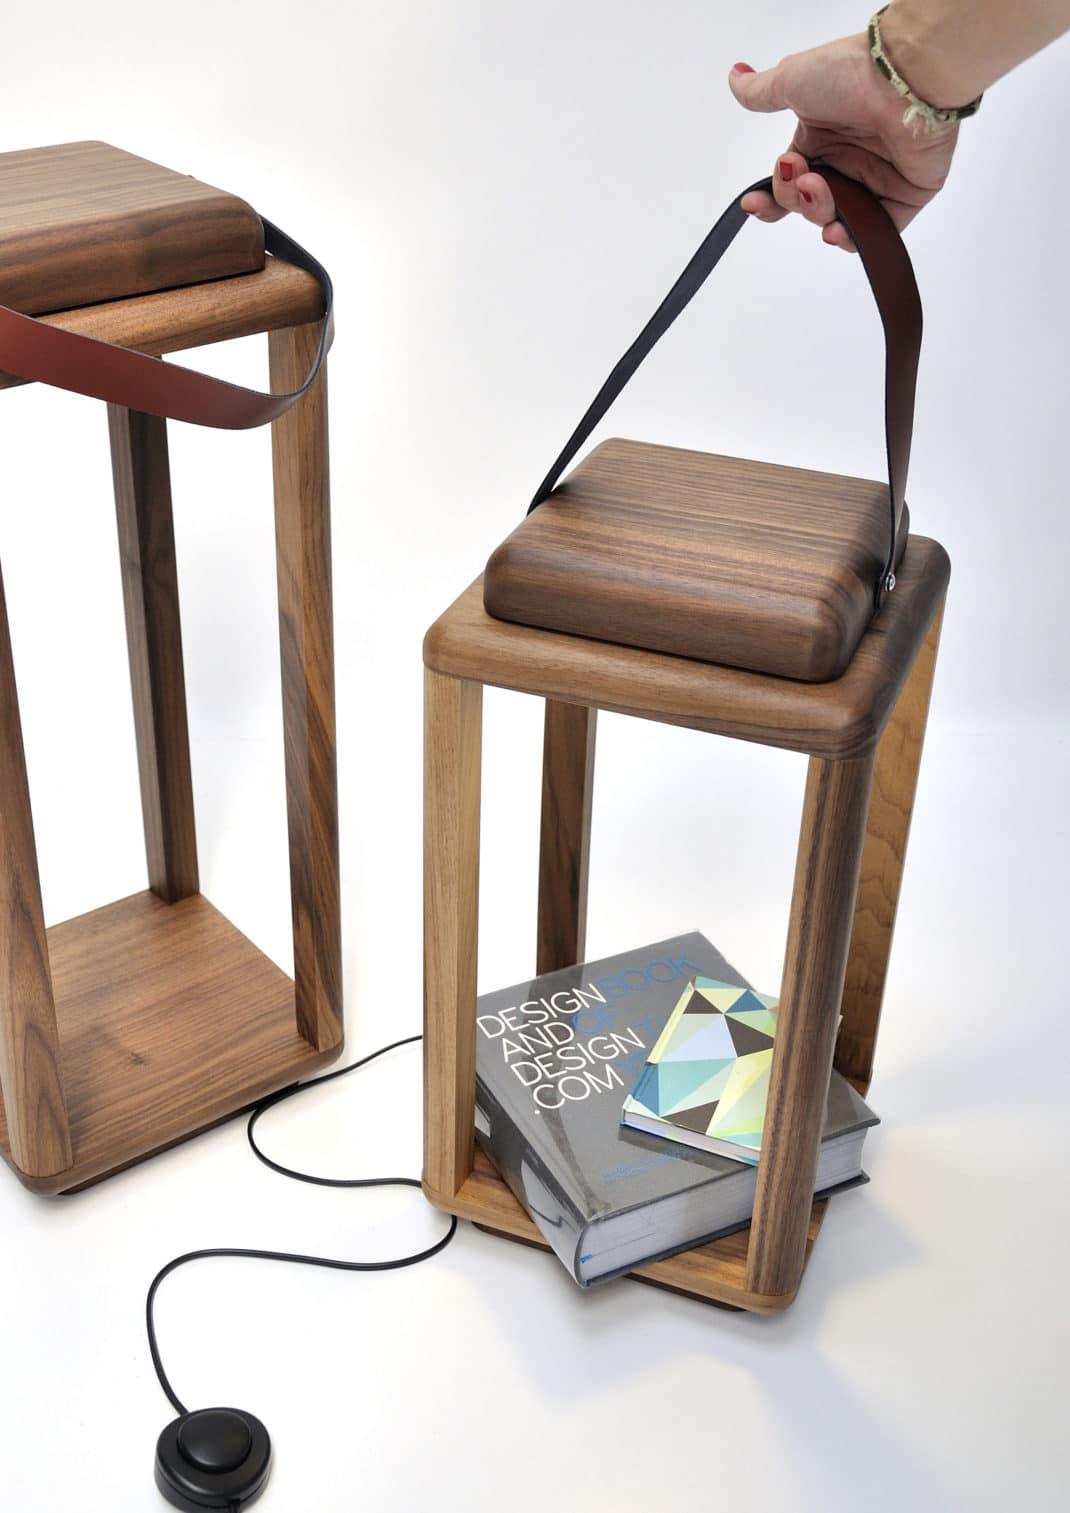 Nauset une version moderne de la lanterne by paolo gerosa - Lanterne moderne ...